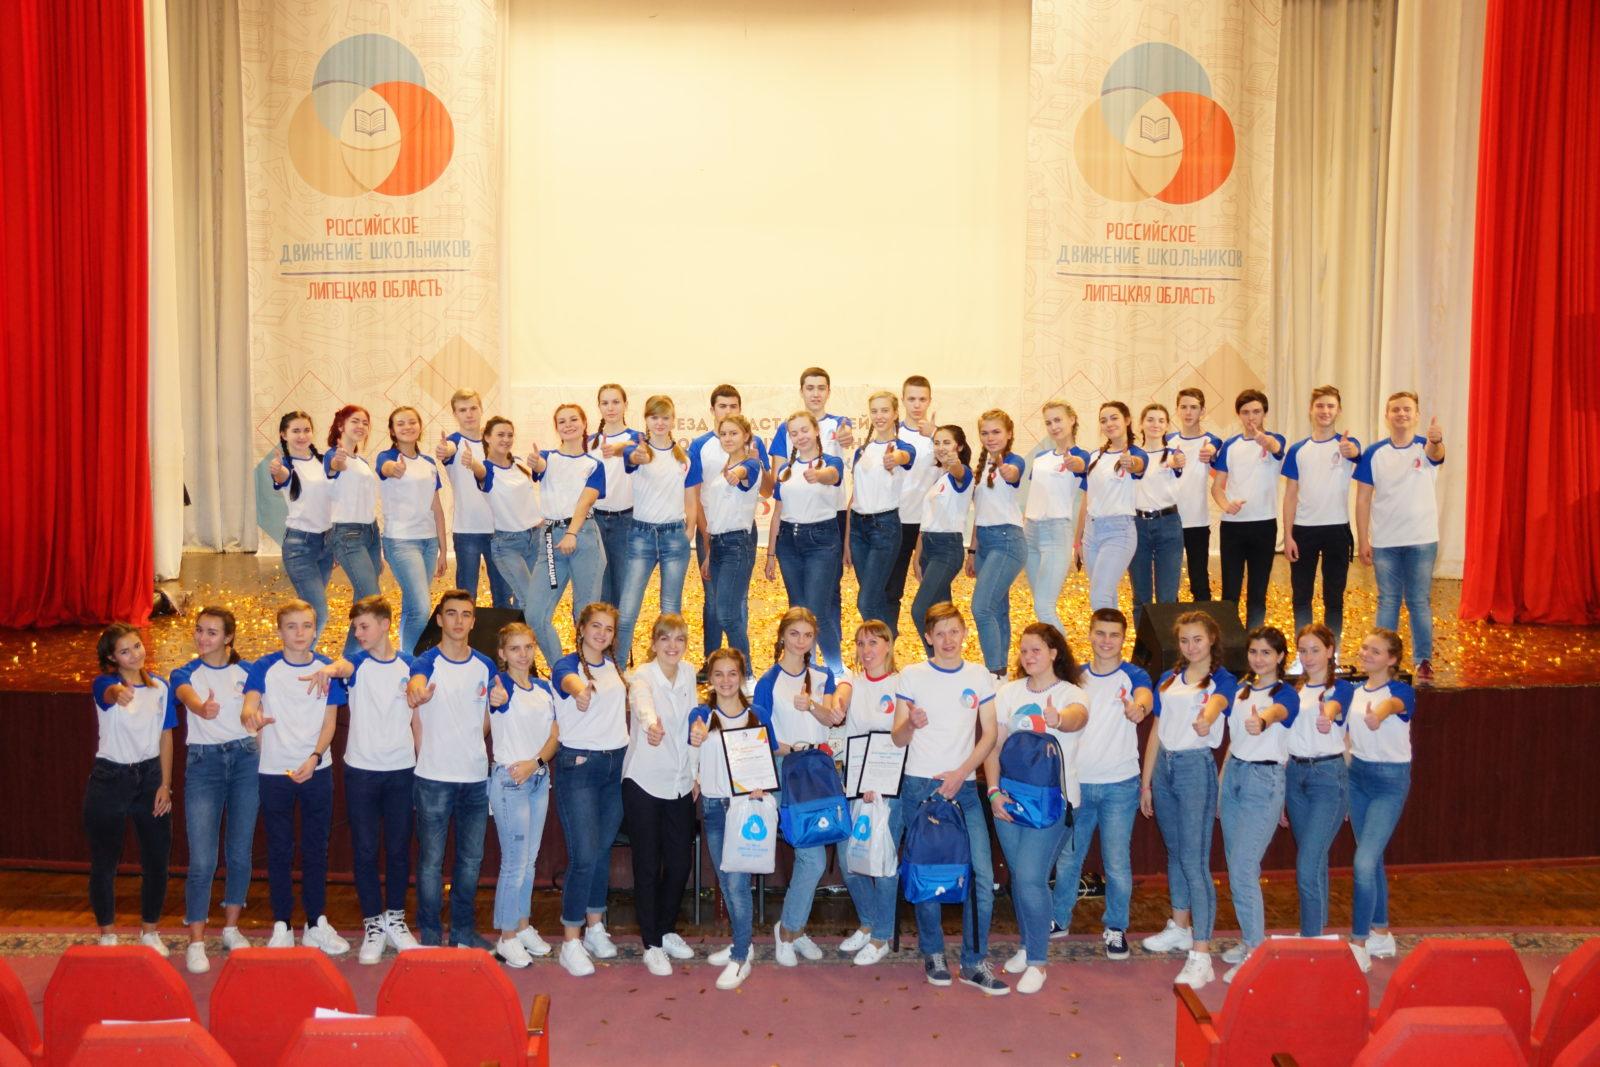 II региональный съезд РДШ — флэшмоб ЭКОлидеры